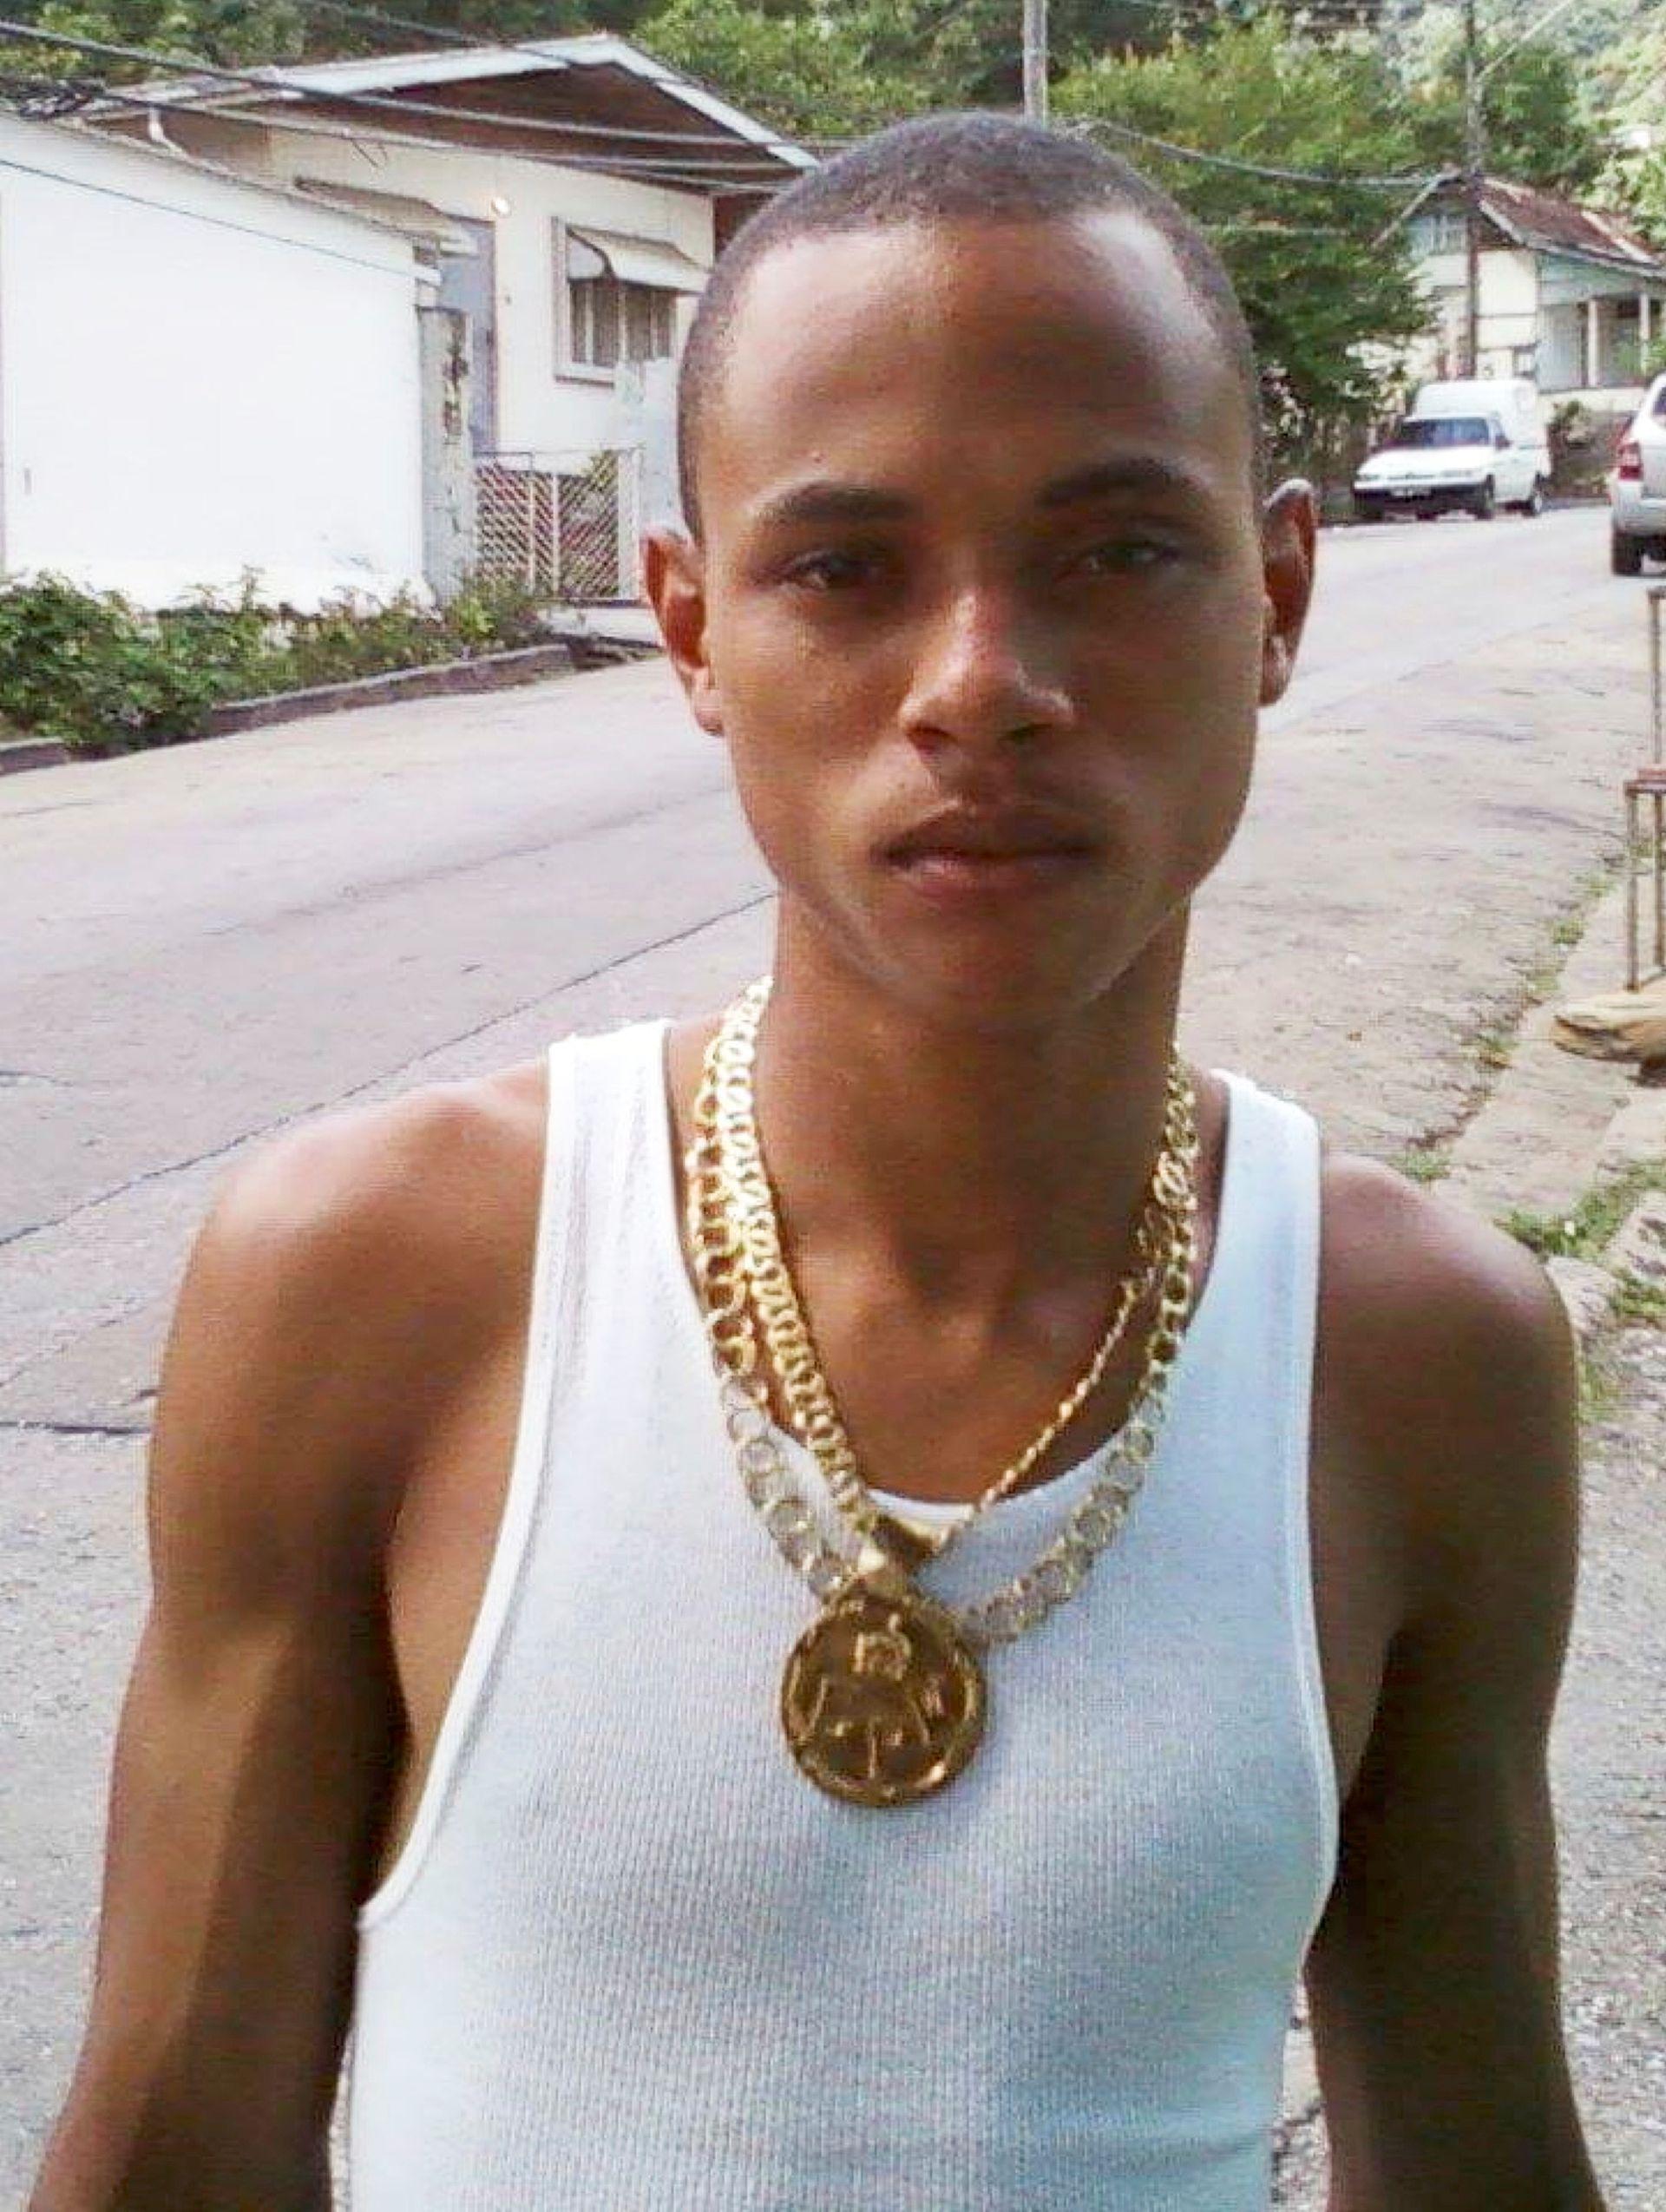 Missing Trinidad man found dead - Stabroek News